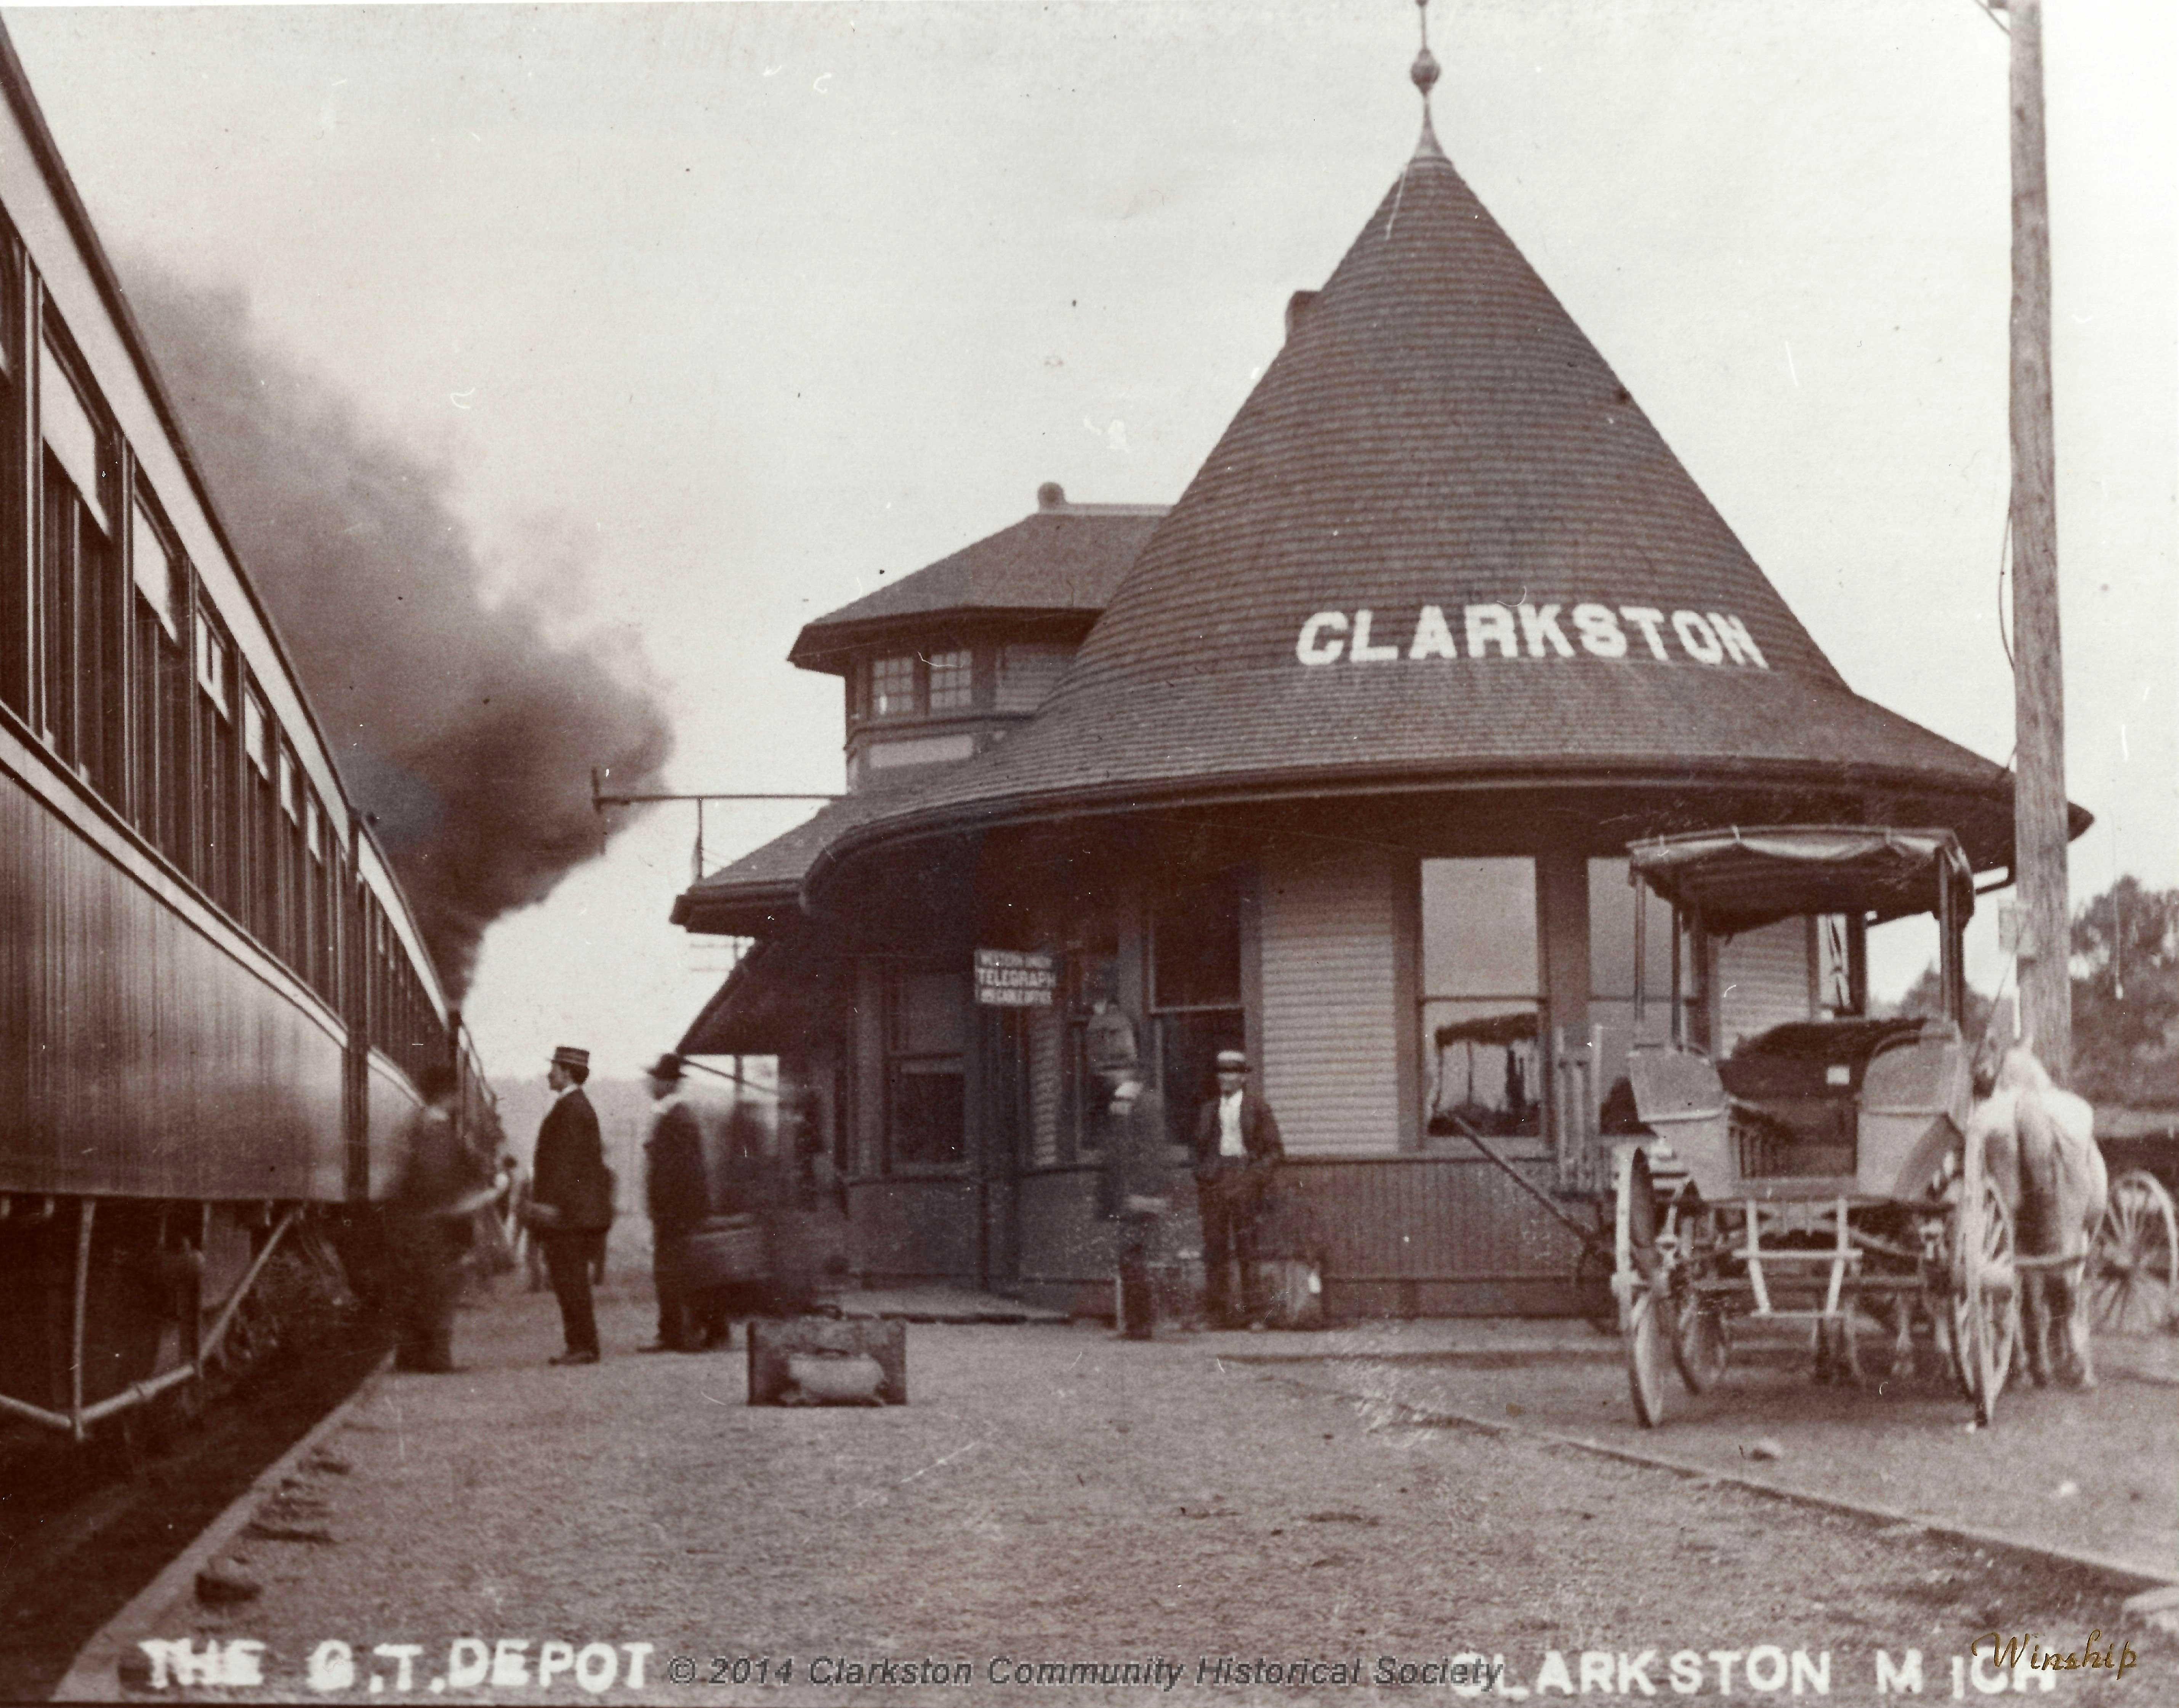 Clarkston Train Depot, c. 1900